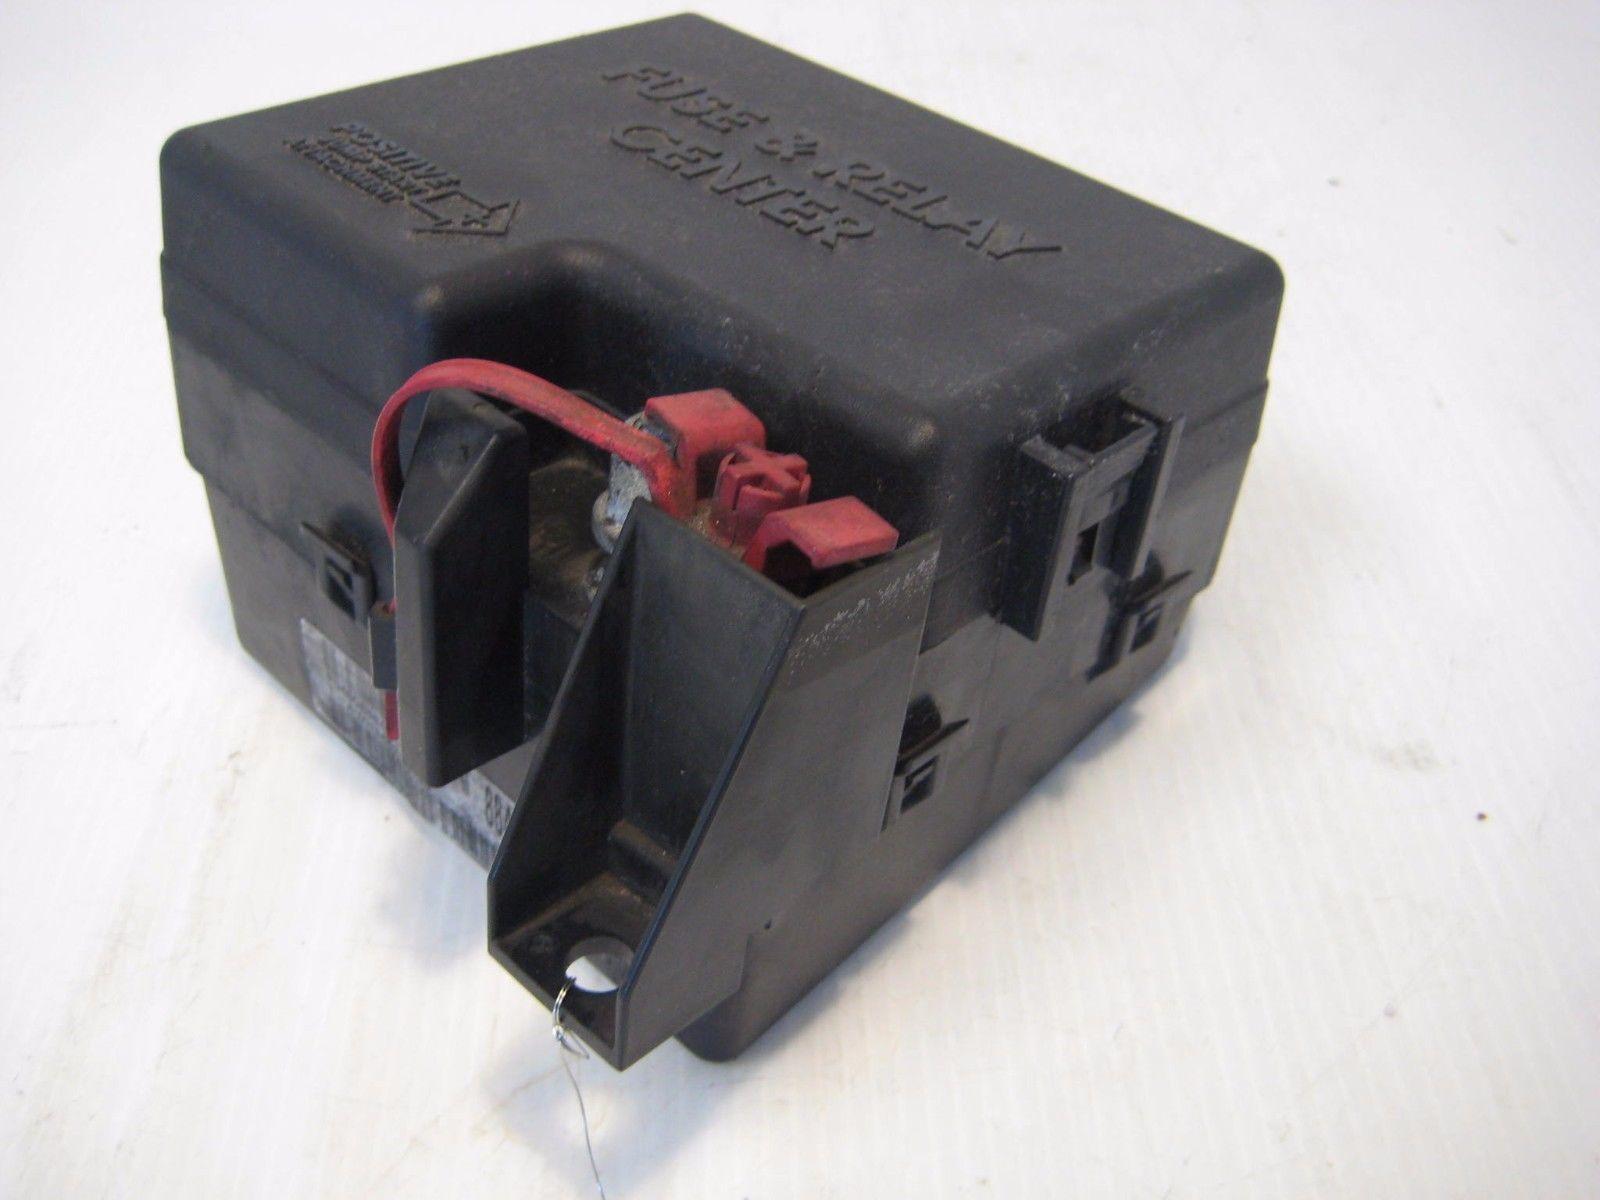 2003 chrysler sebring engine fuse relay box compartment. Black Bedroom Furniture Sets. Home Design Ideas